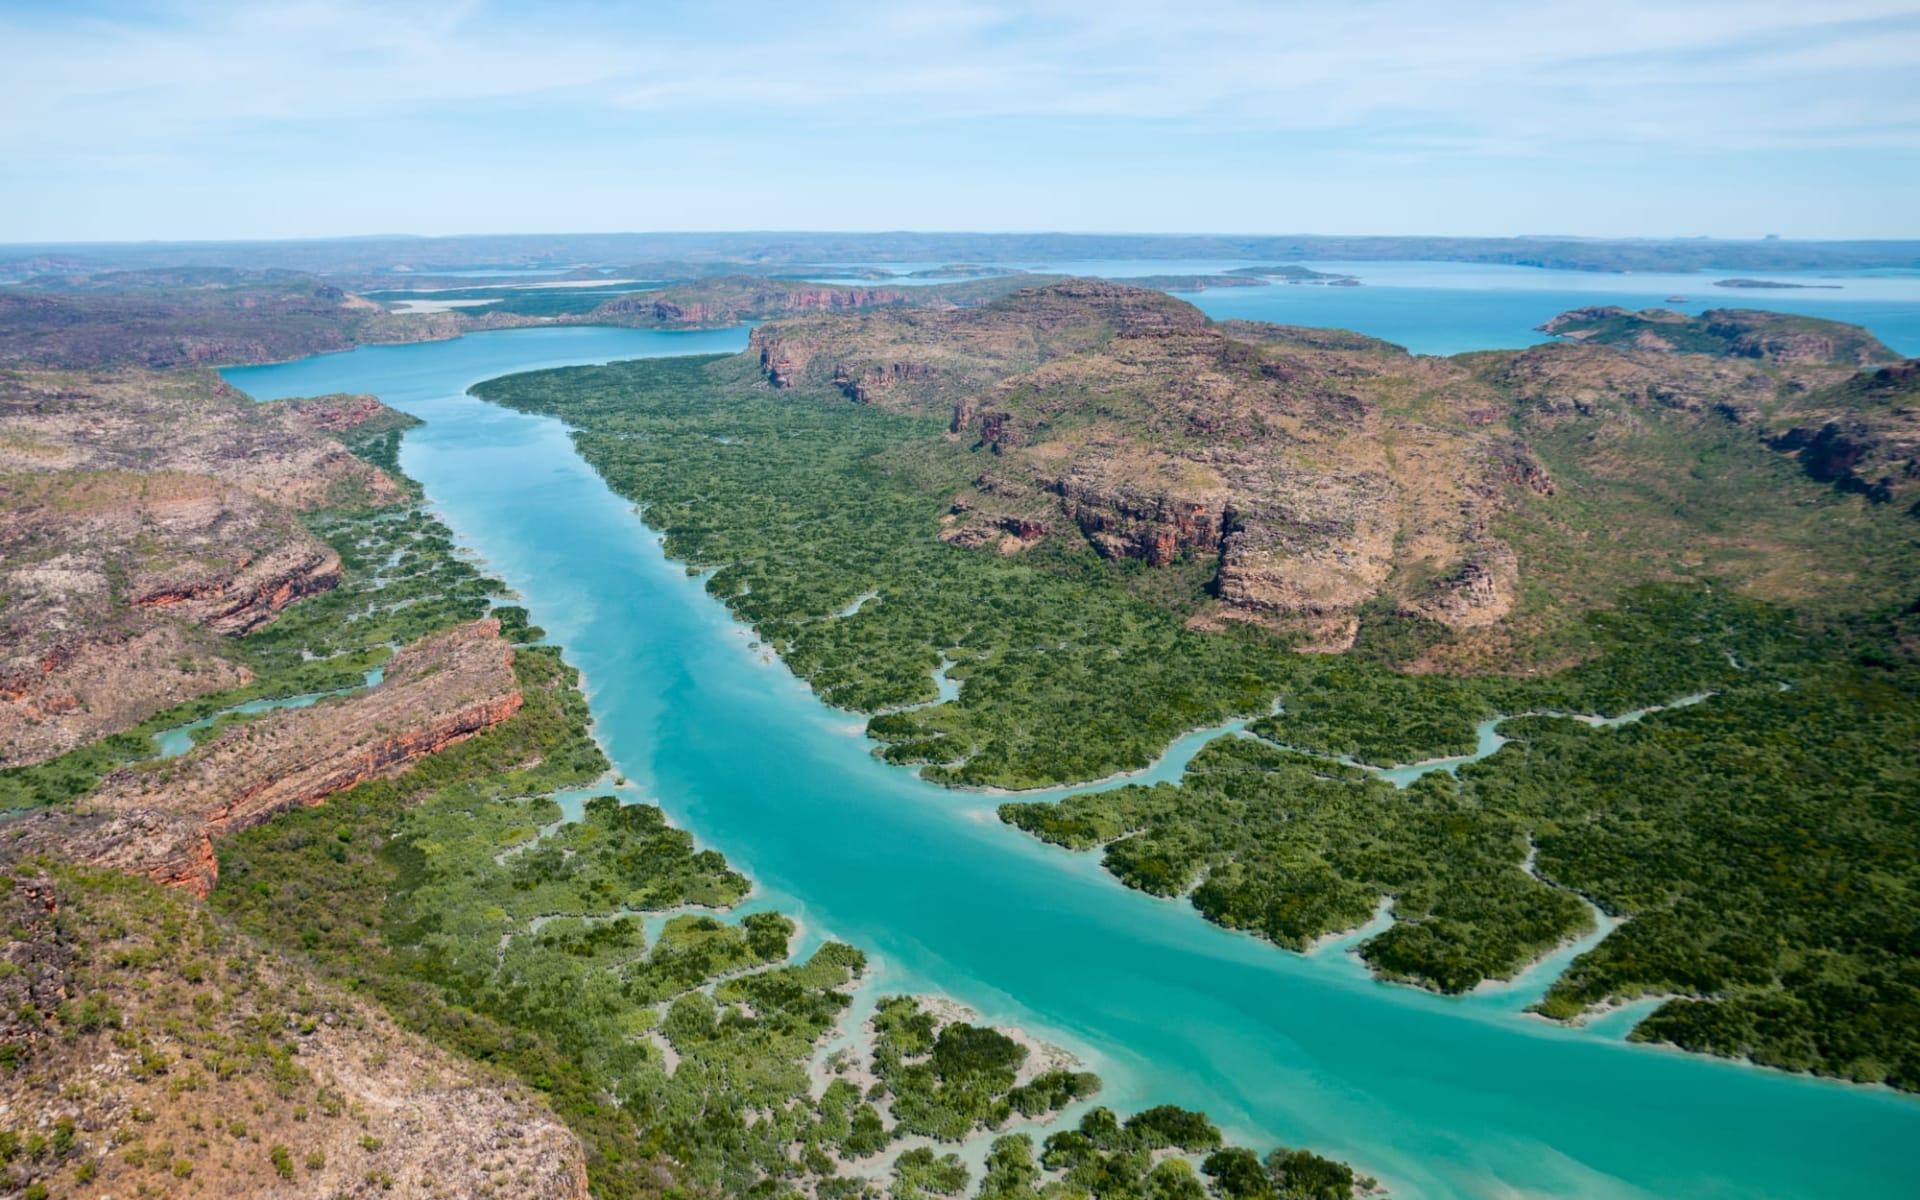 Expeditions-Kreuzfahrten Kimberley ab Darwin: Porosis Creek und Naturalist Island